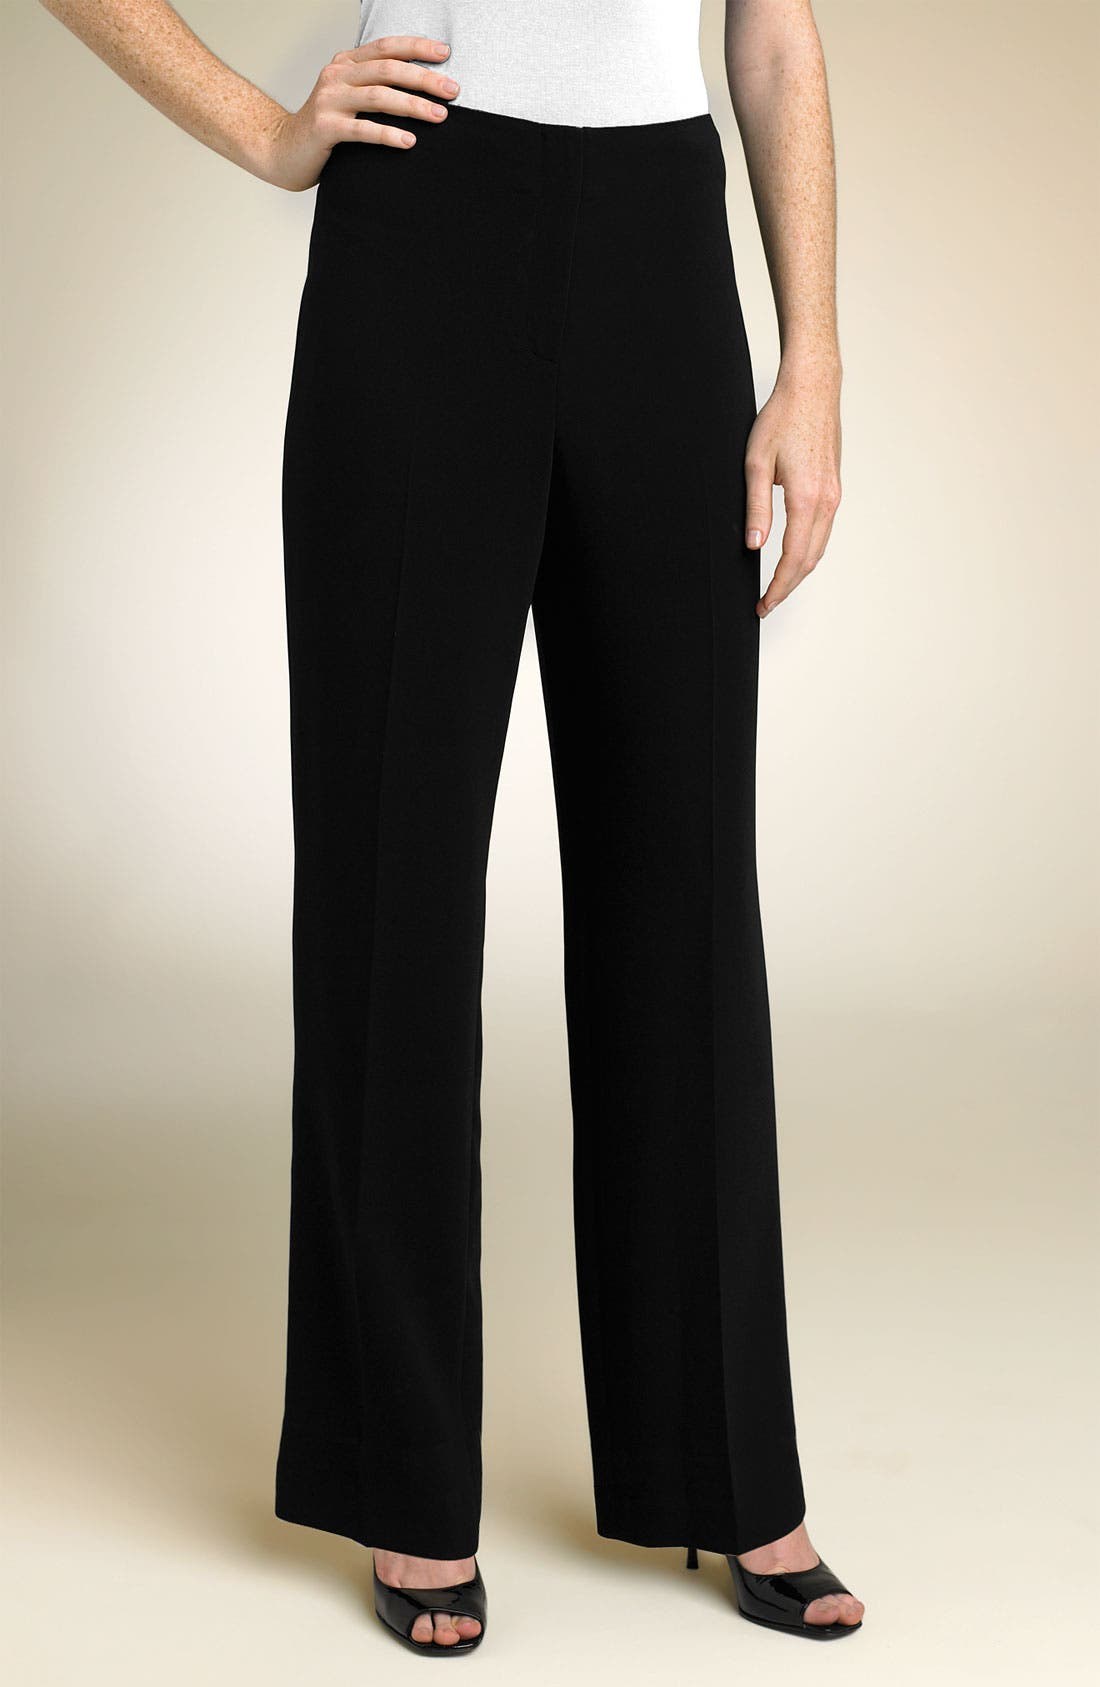 Alternate Image 1 Selected - Louben Straight Leg Trousers (Petite)